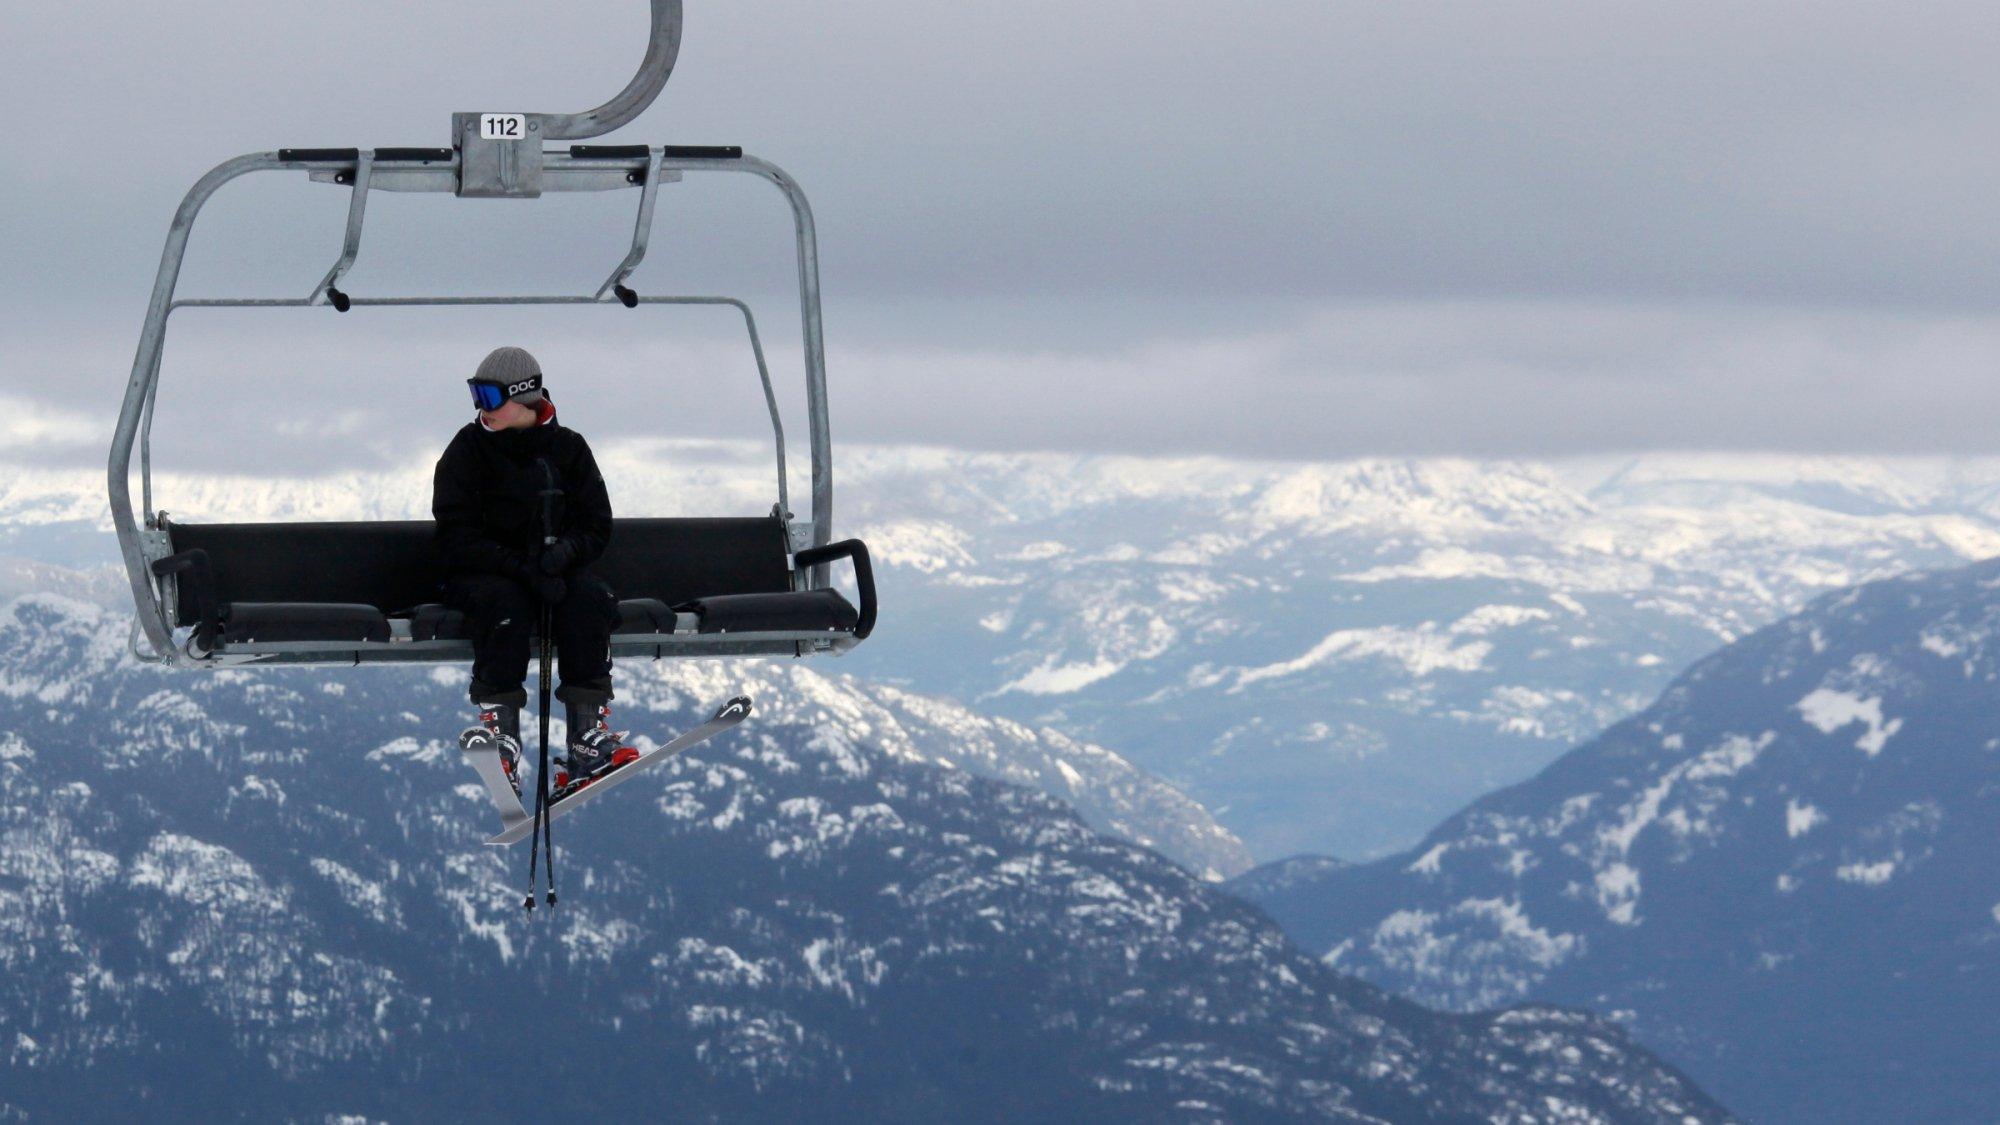 ski lift skiing snowboarding - photo #1